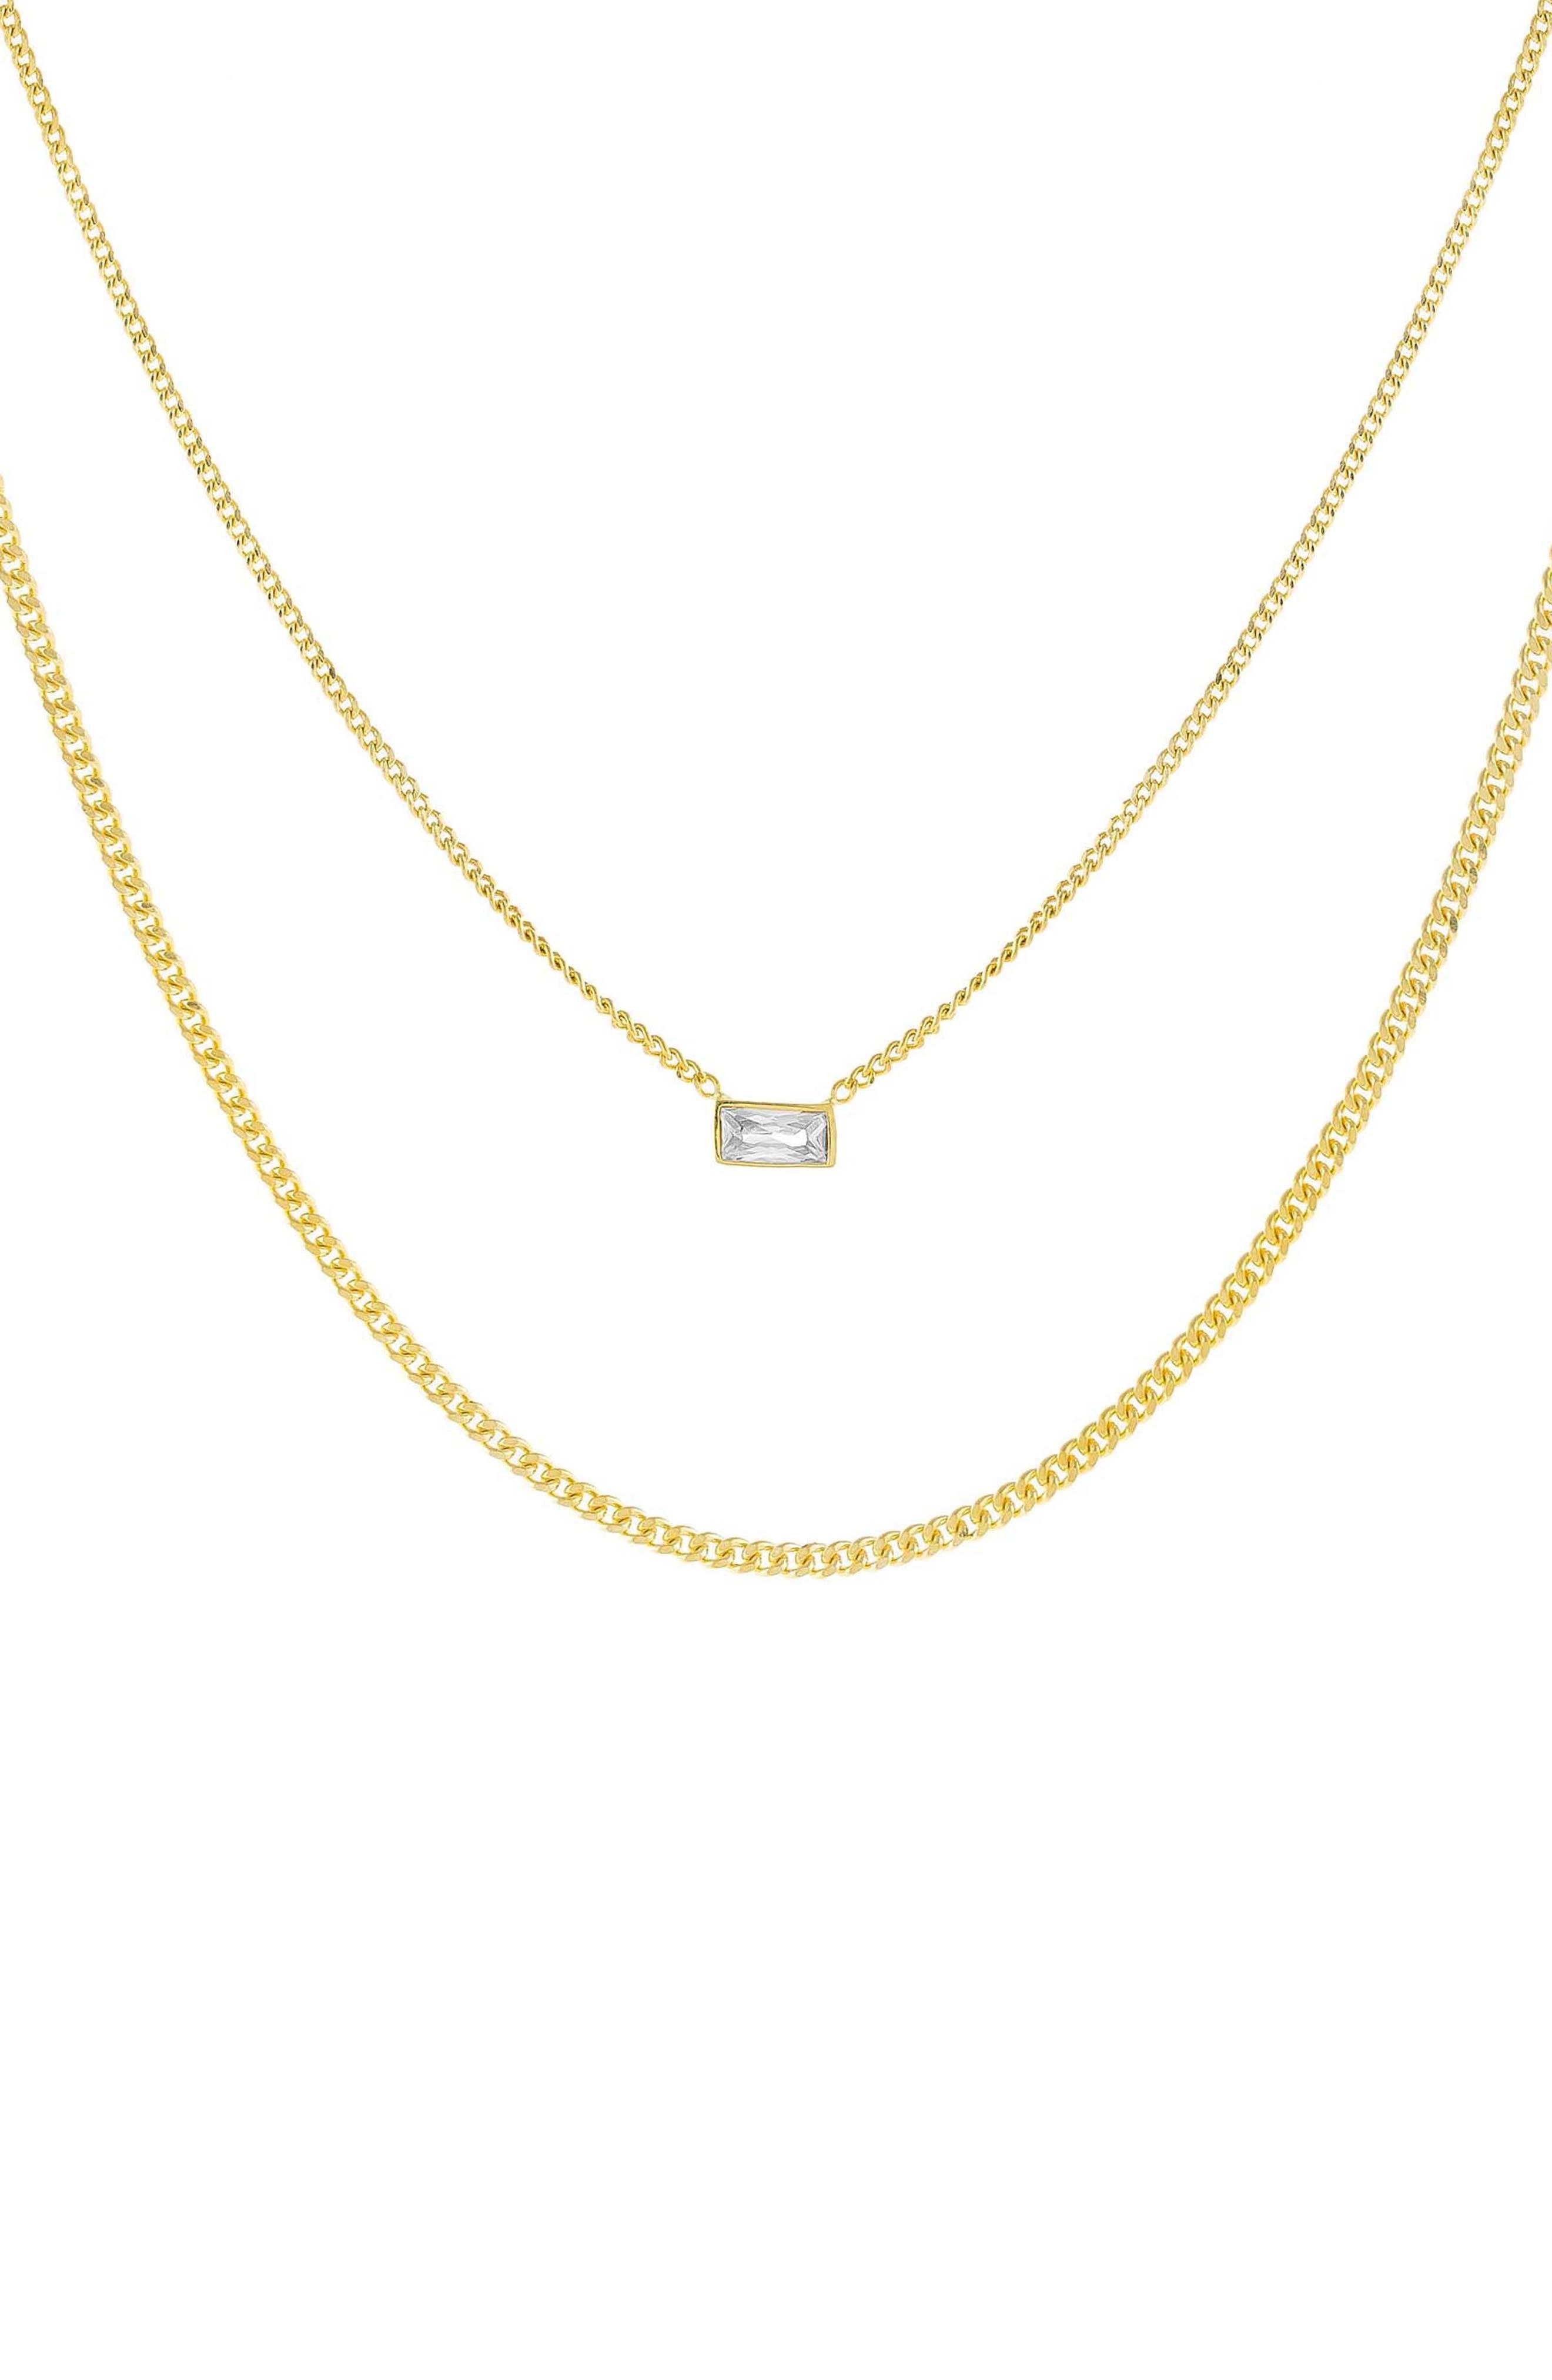 Women's Adina's Jewels Cubic Zirconia Baguette Double Chain Necklace